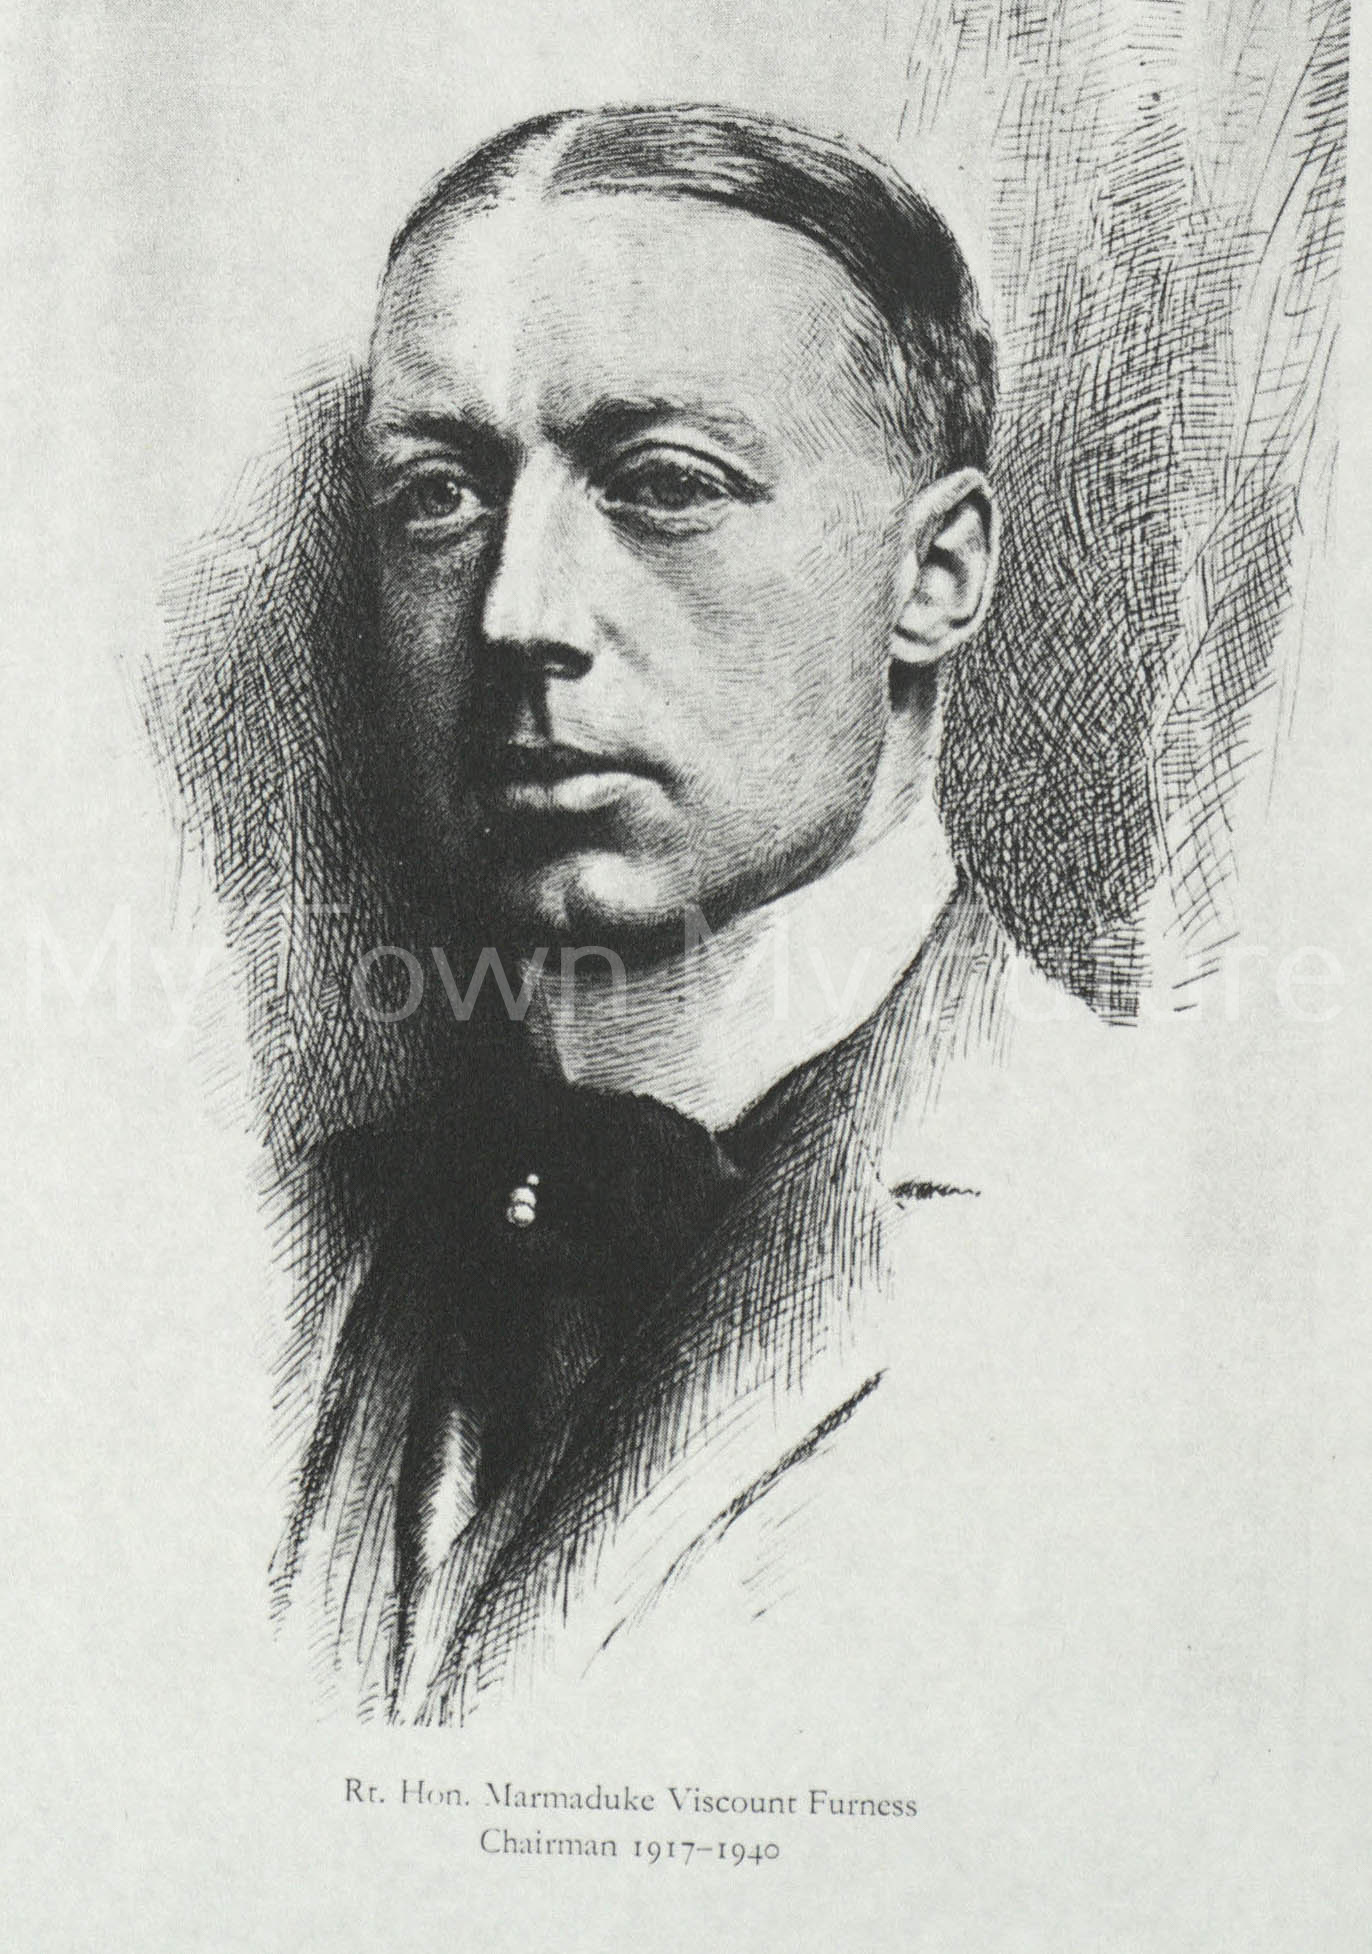 Rt Hon Marmaduke Viscount Furness